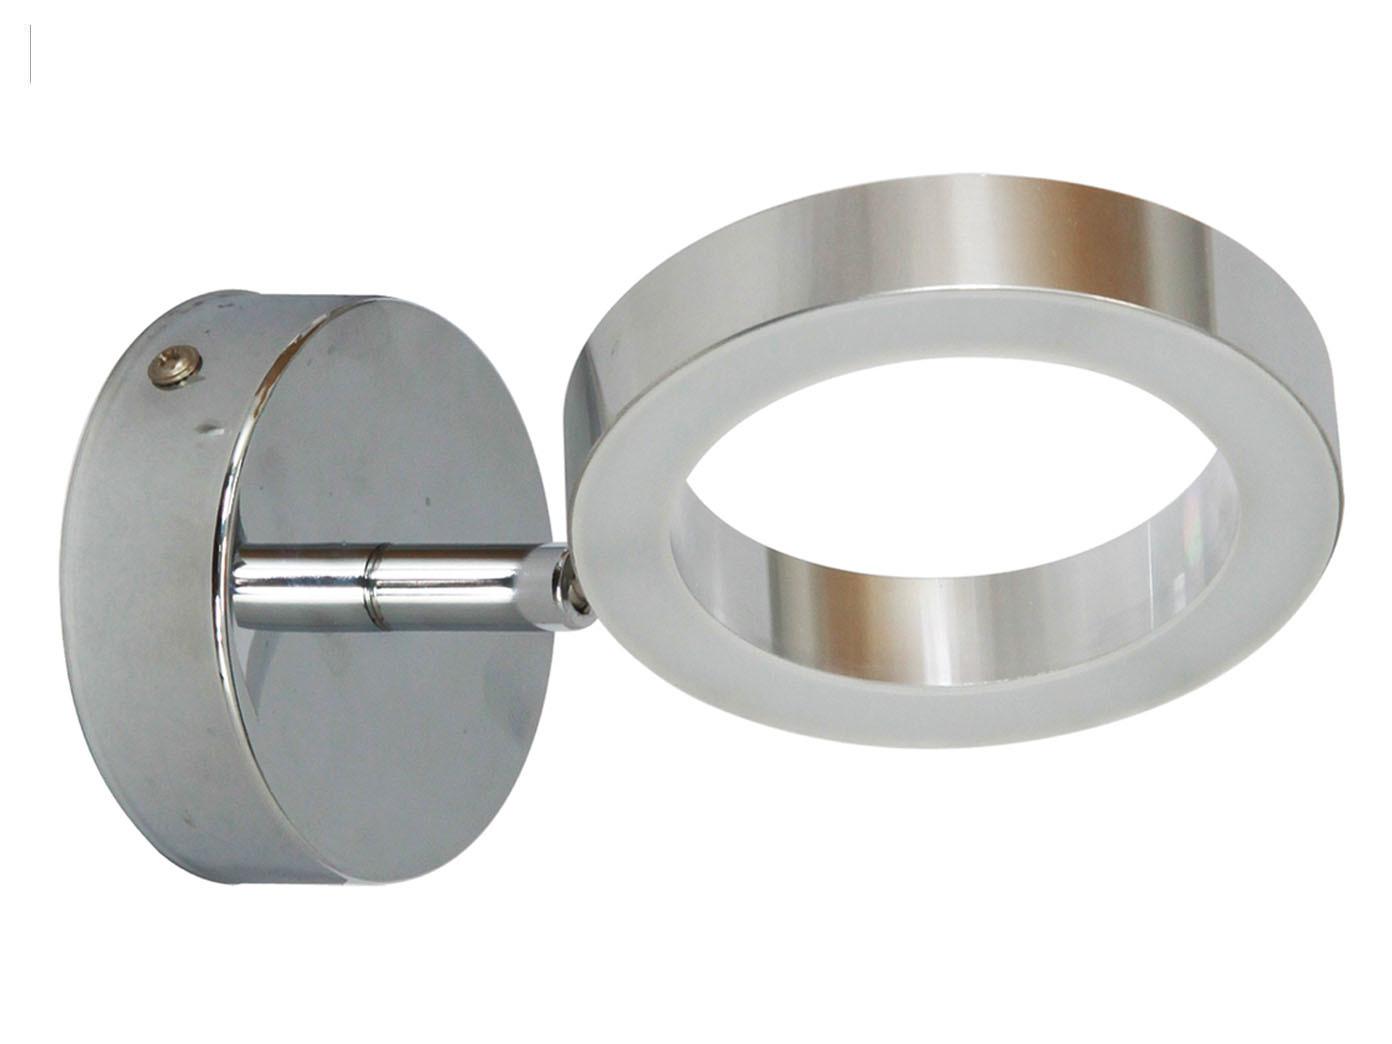 Moderne LED Wandleuchte ANZIO frs Badezimmer